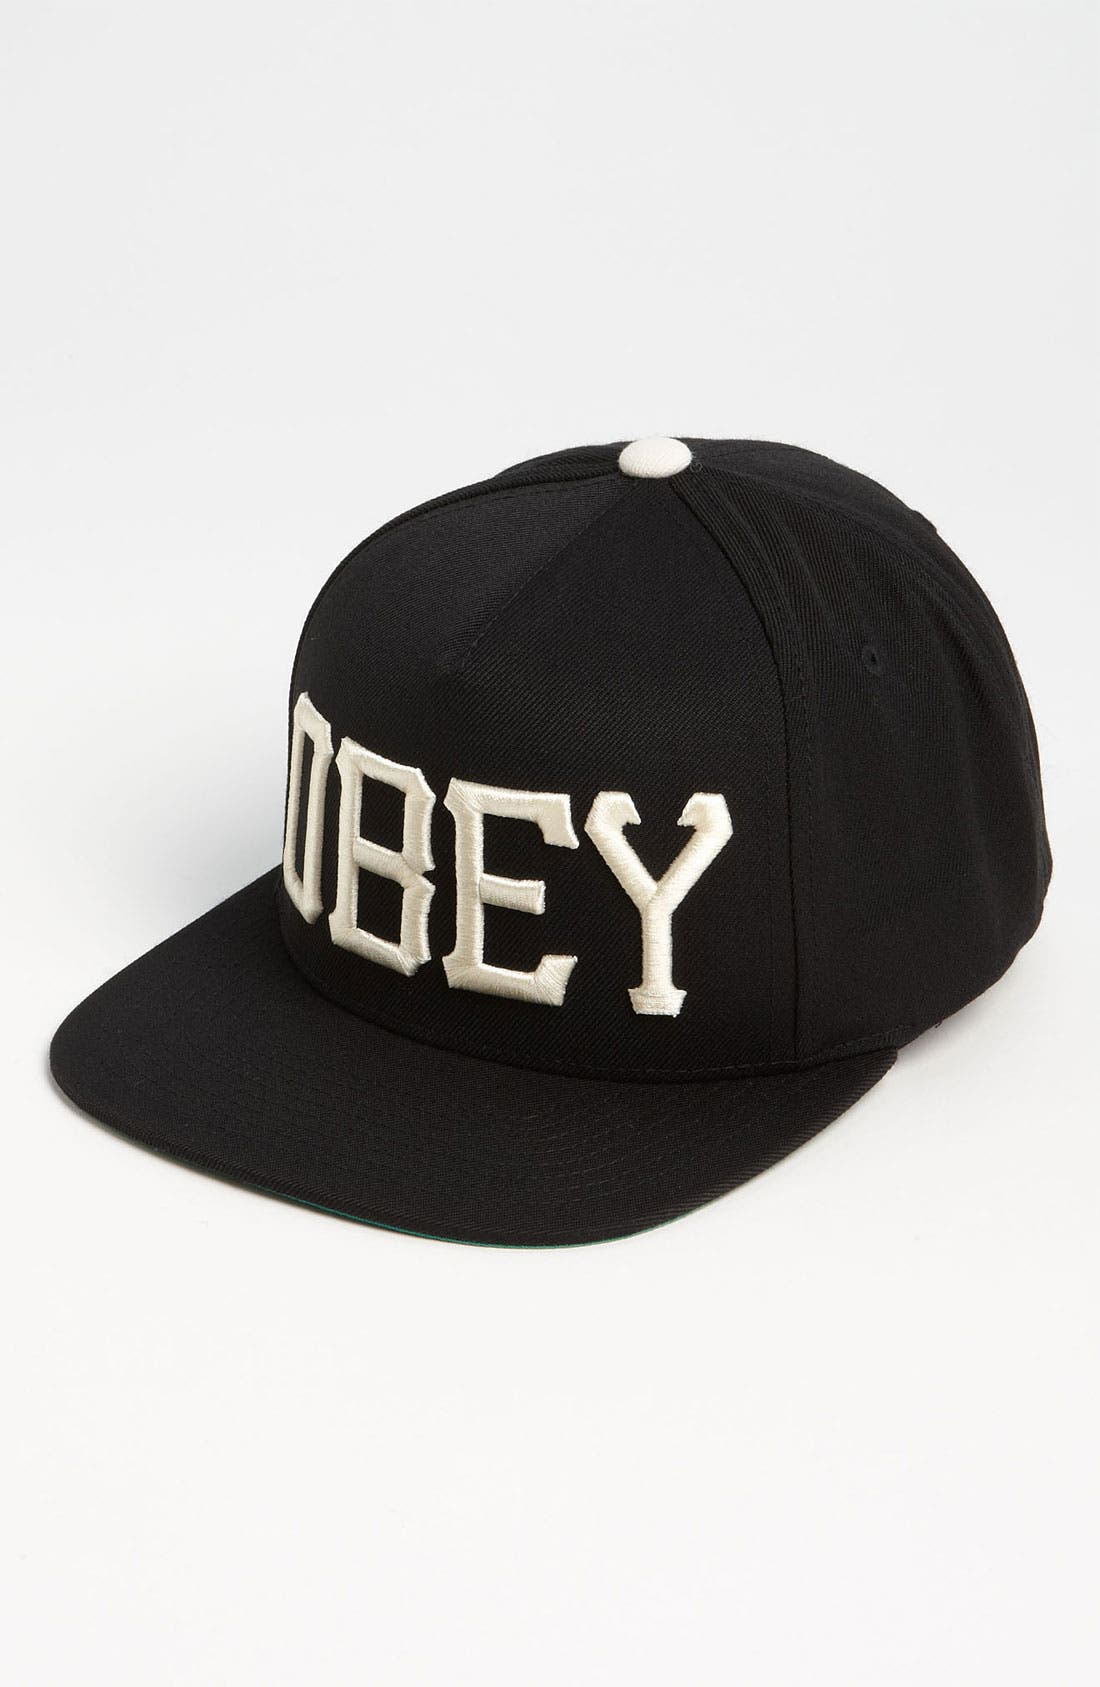 Alternate Image 1 Selected - Obey 'Cedar' Snapback Cap